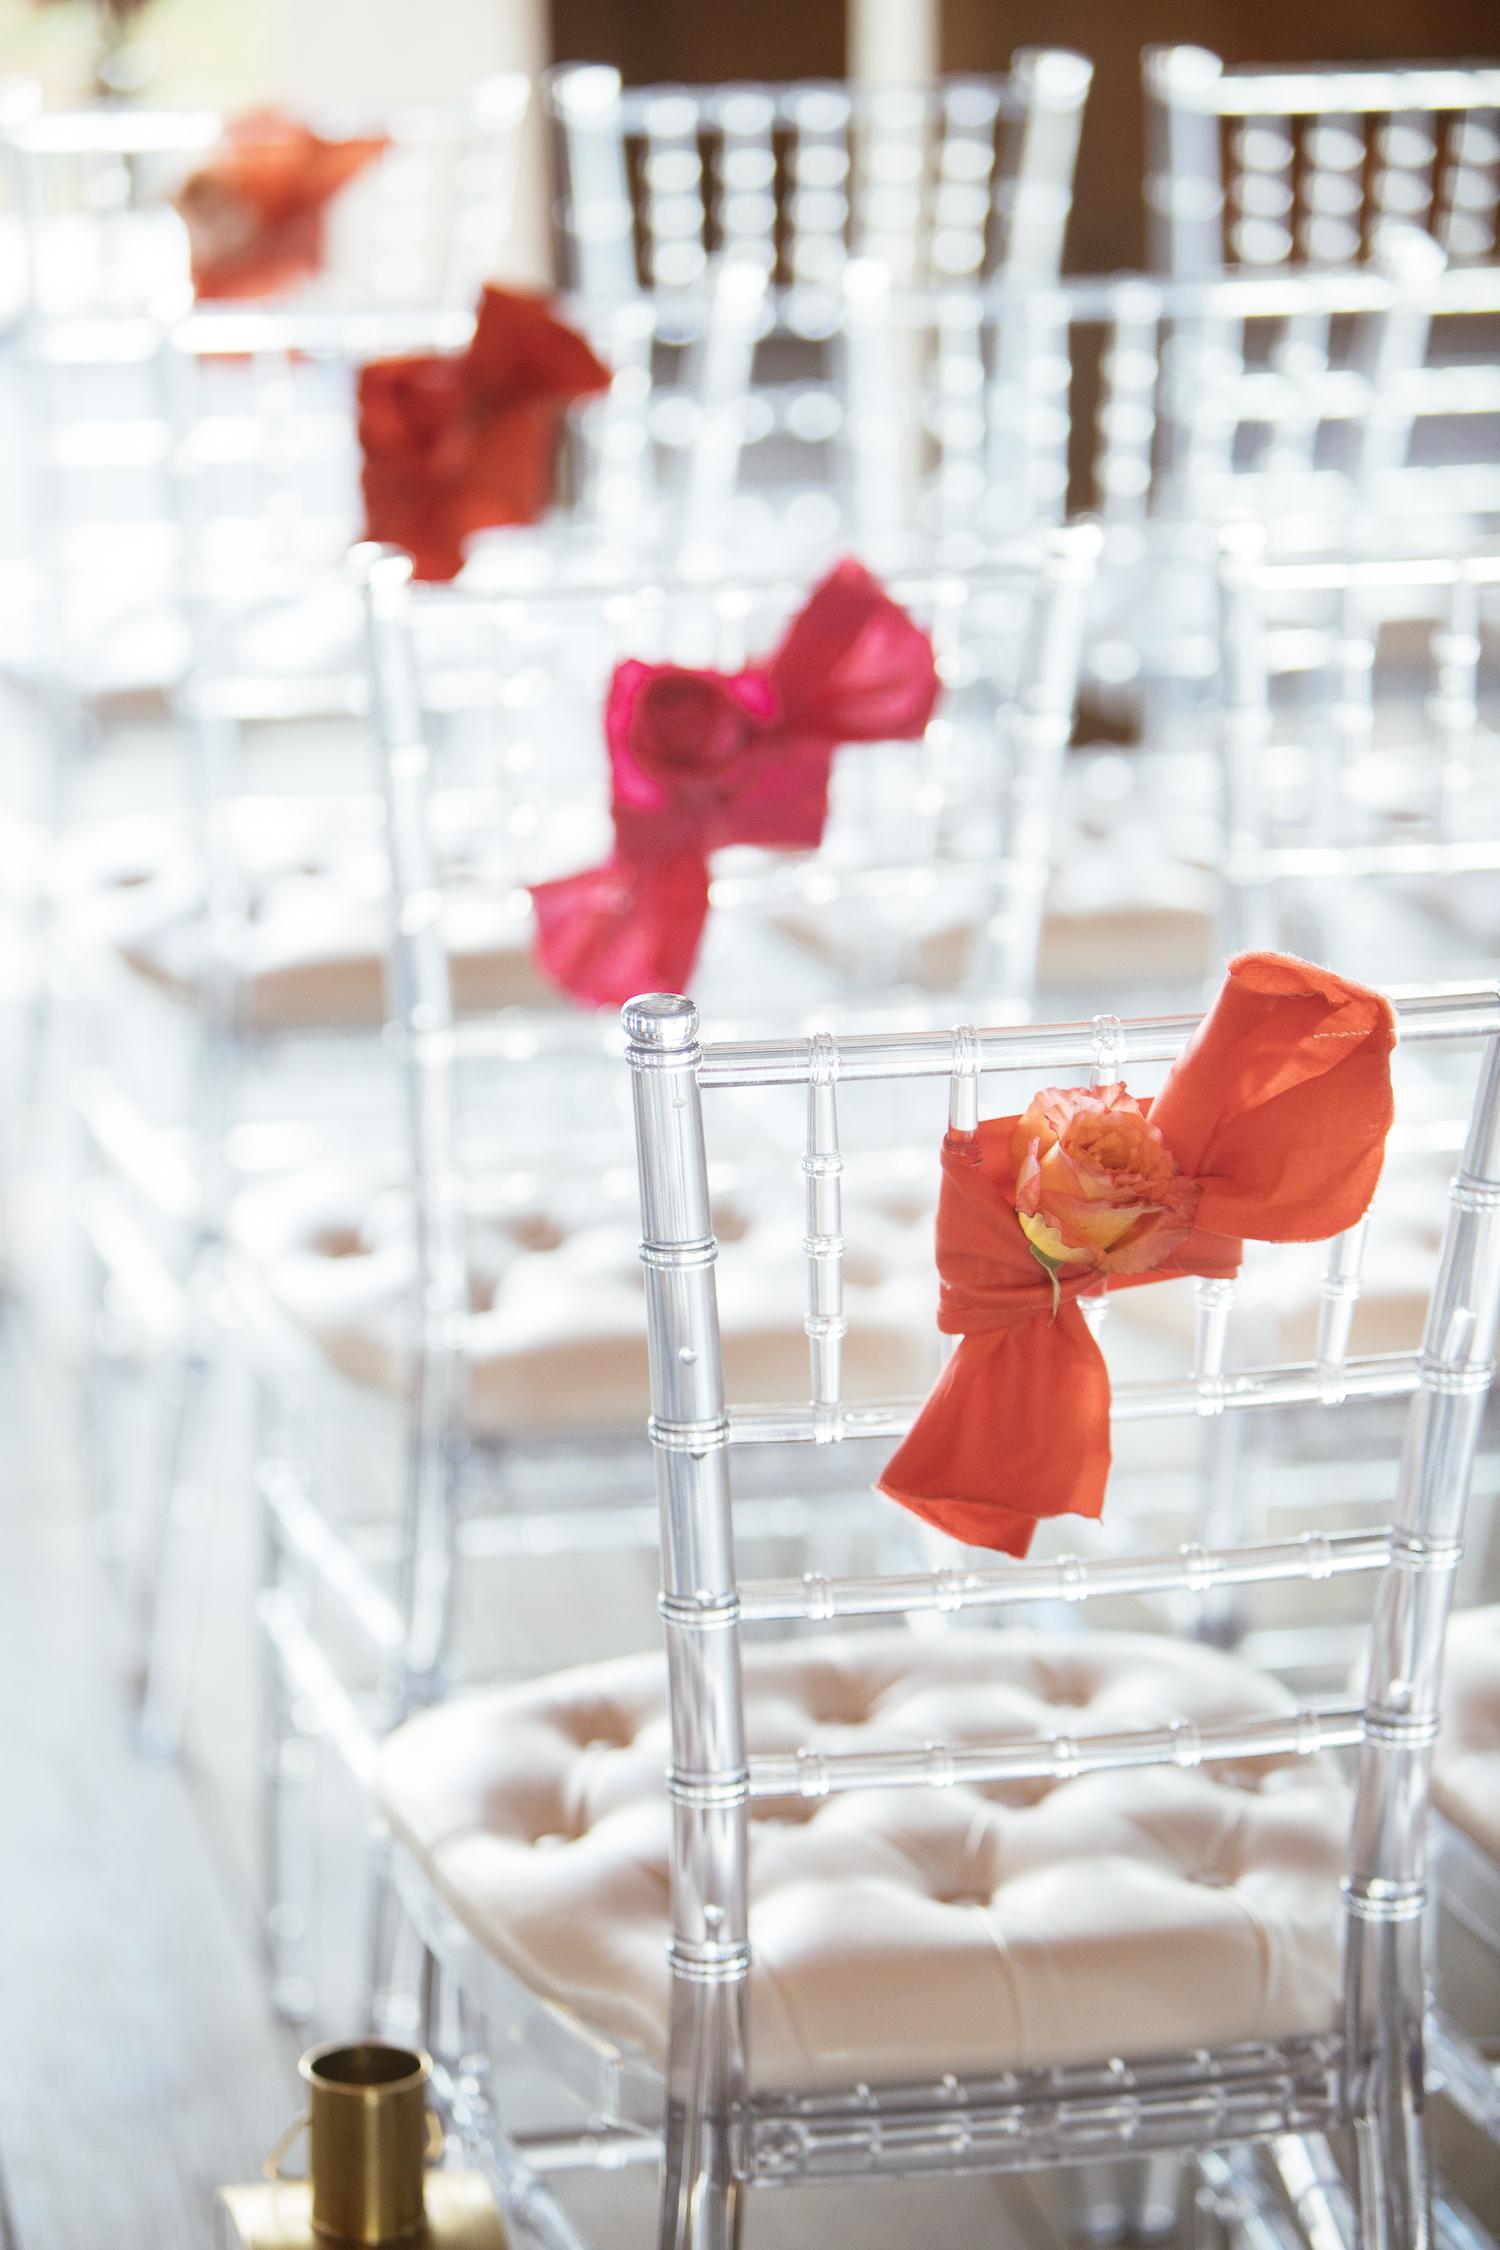 128-malloy-events-summer-theme-by-brianadamsphoto.com.jpg